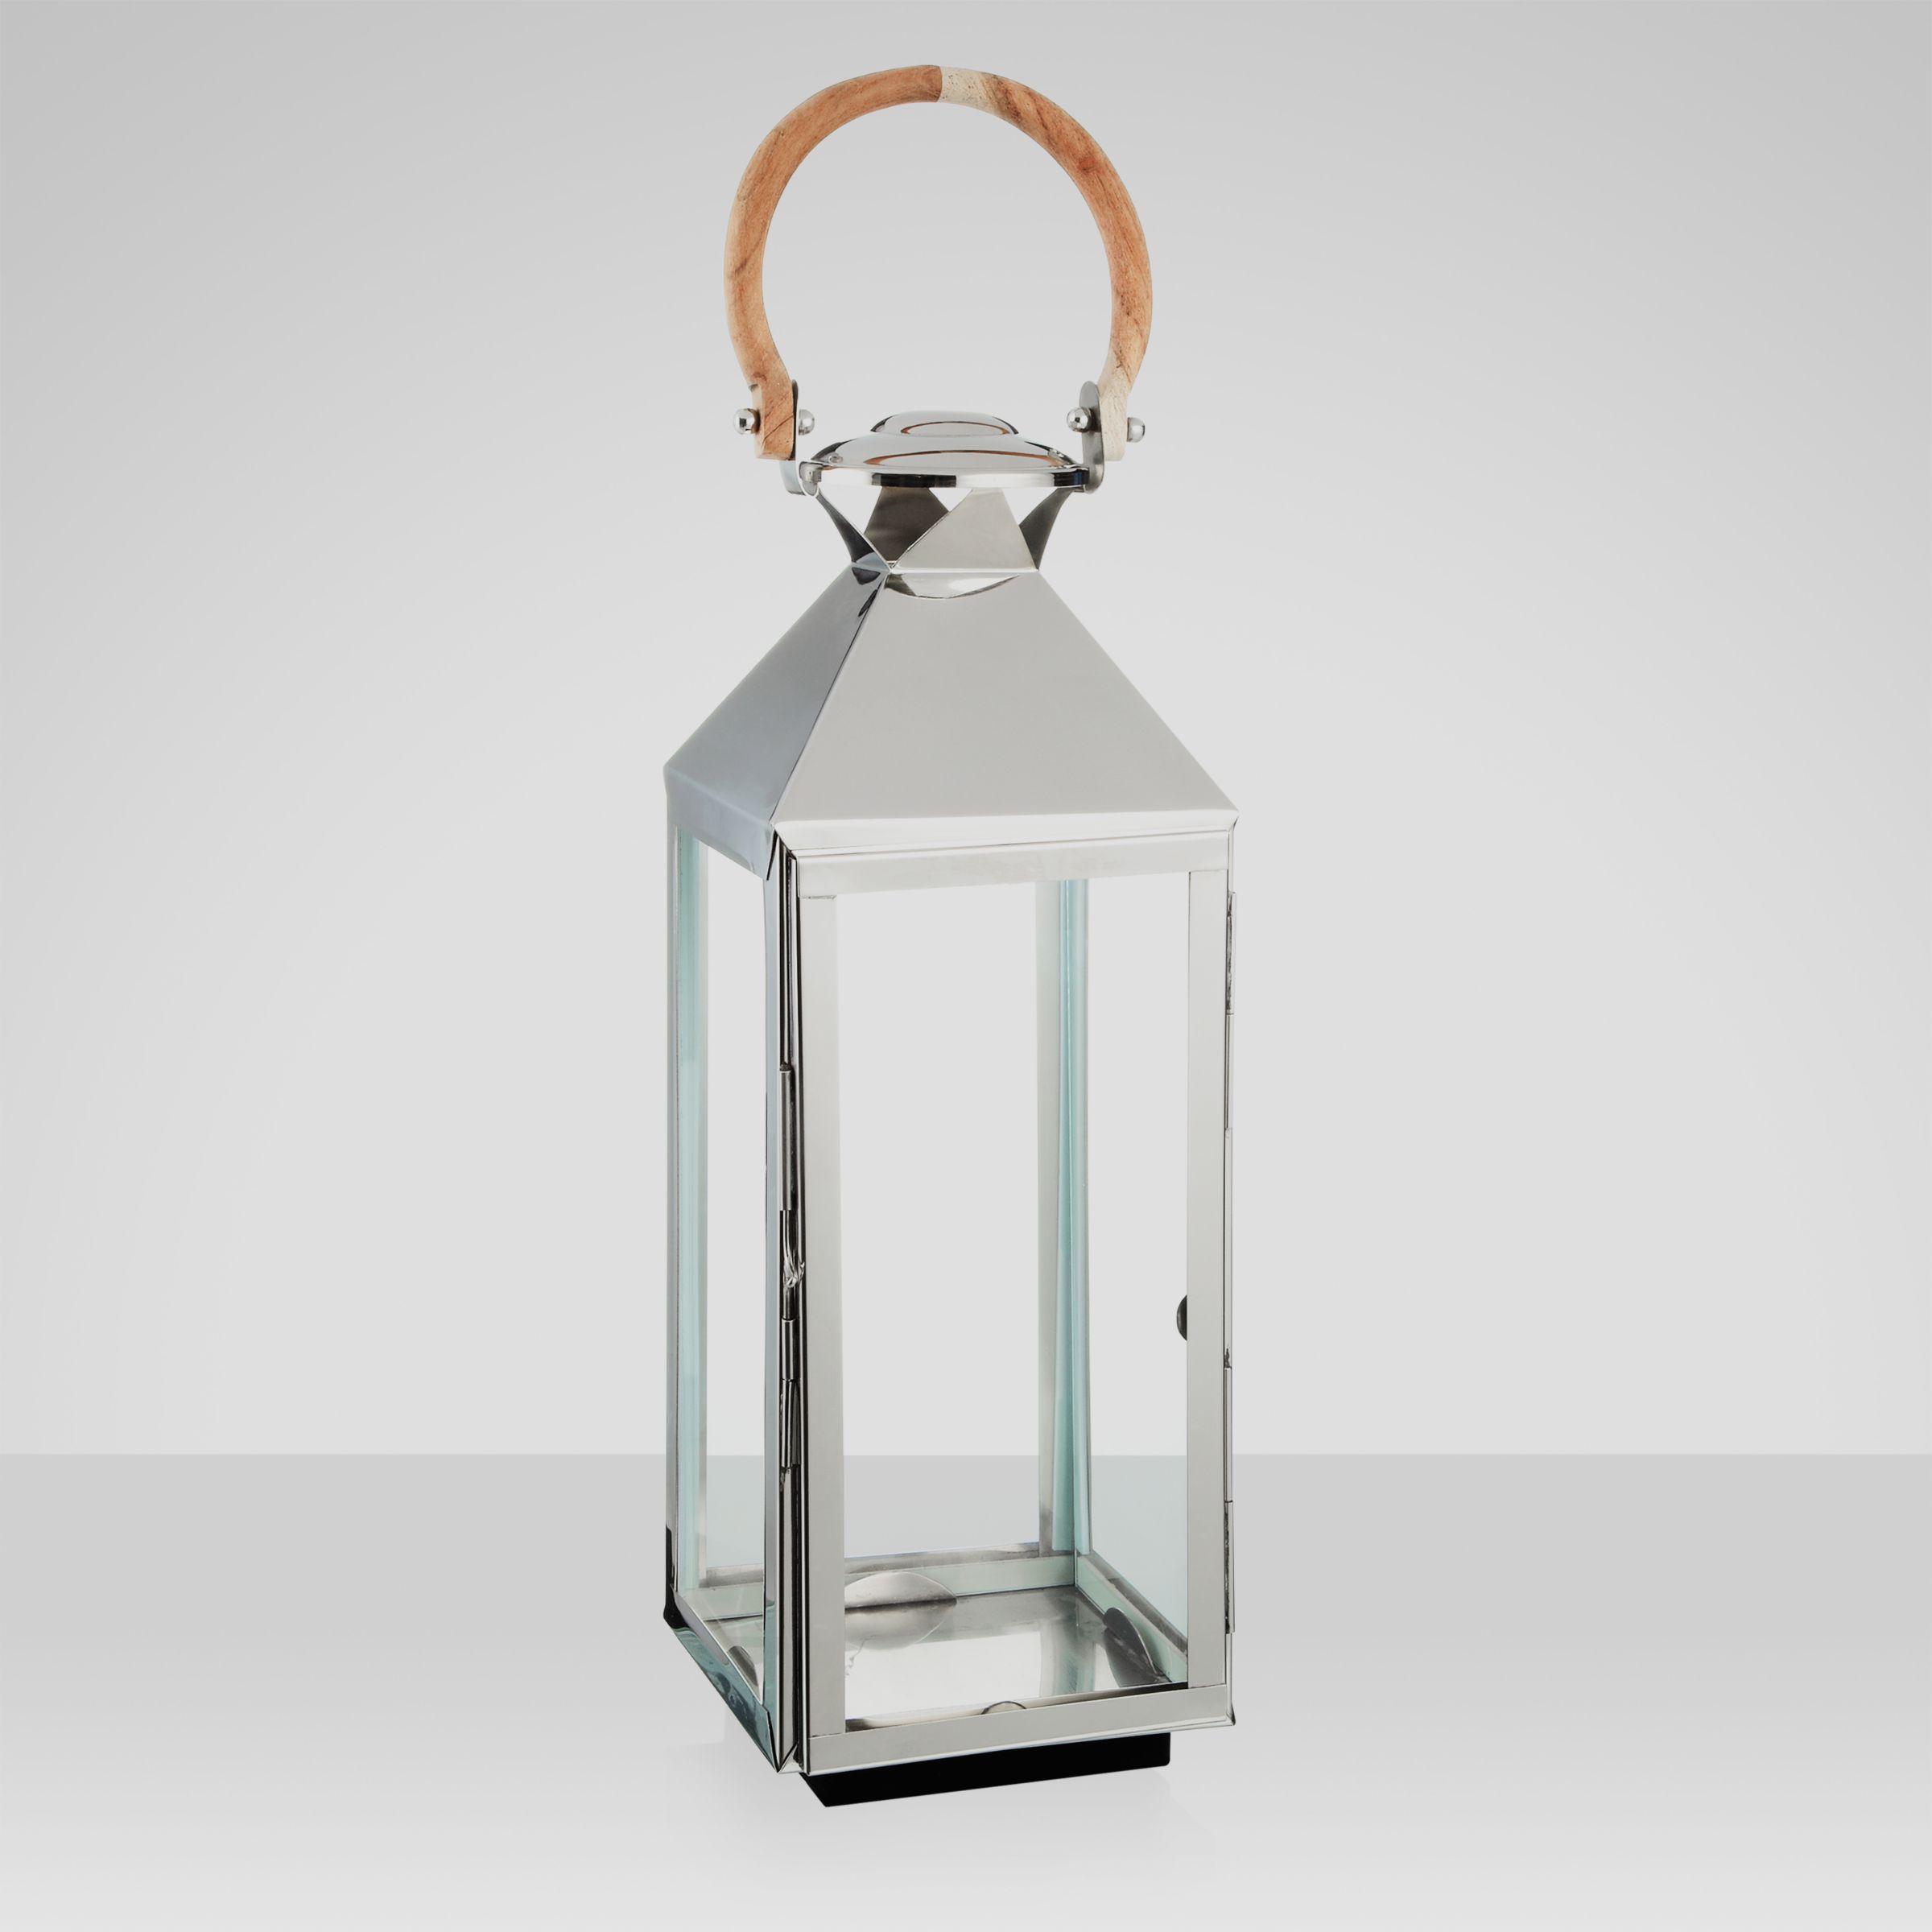 Culinary Concepts Tall Venetian Lantern, Small